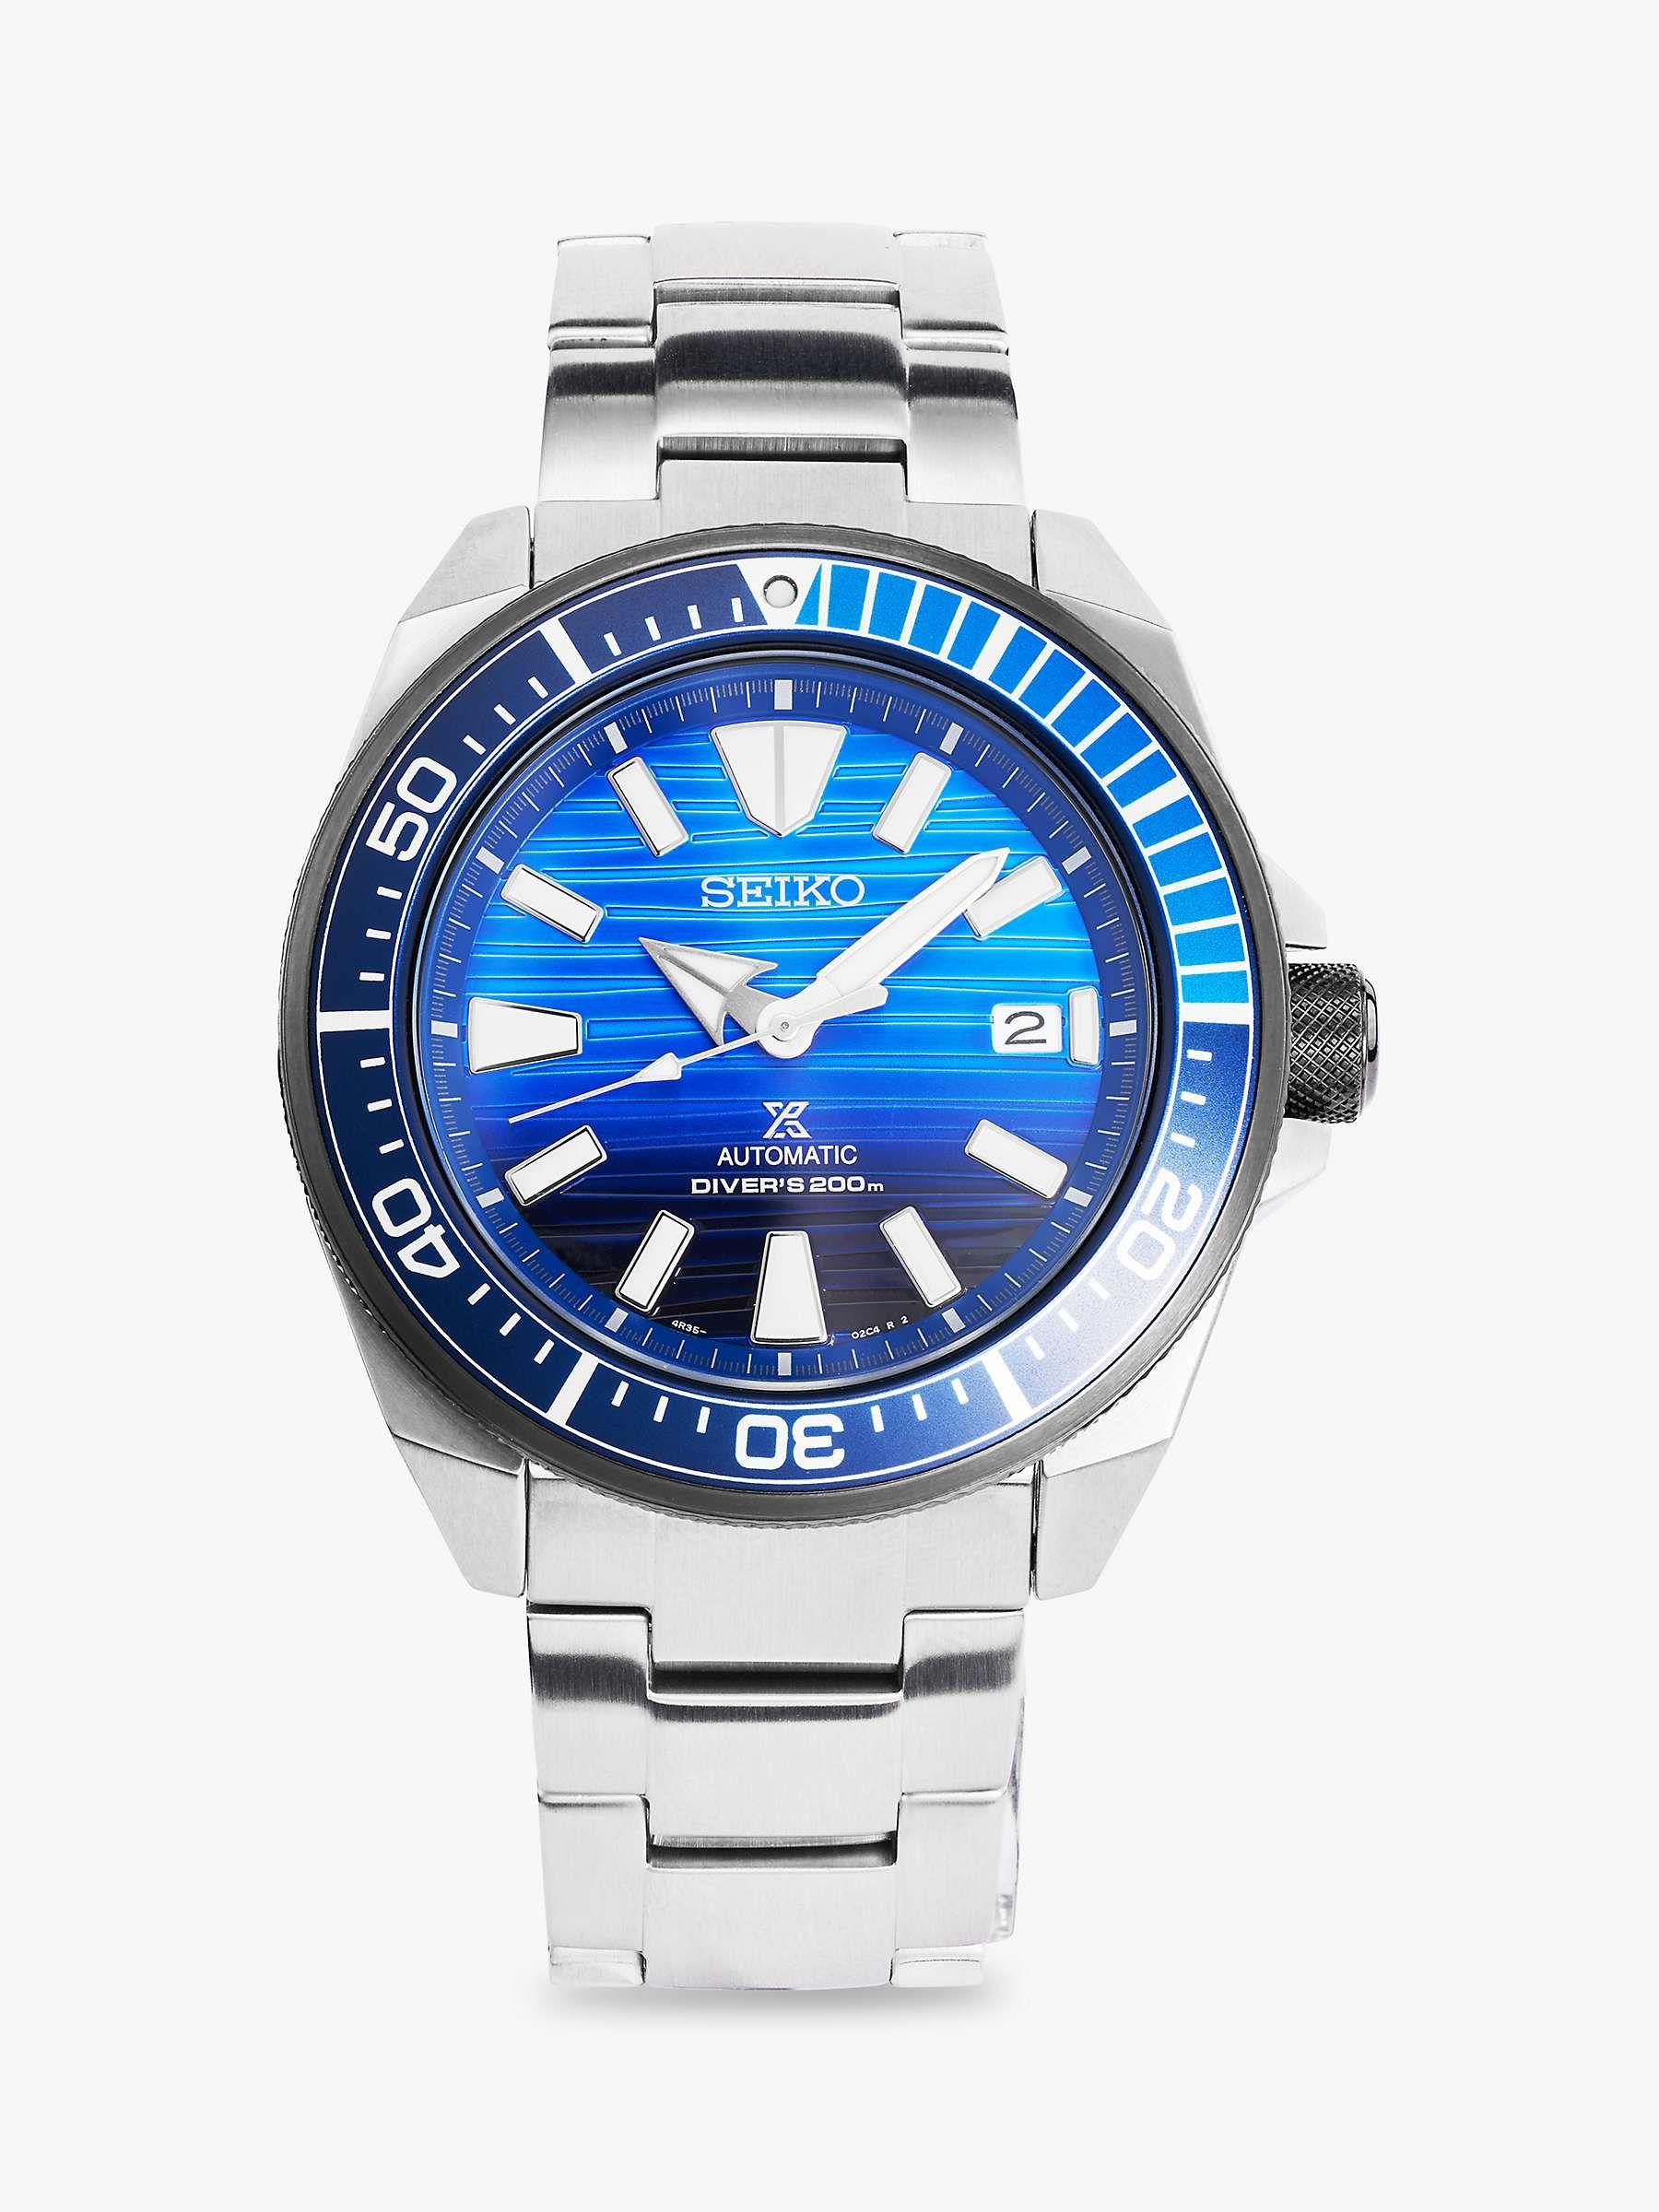 Seiko Samurai SRPC93K1 Men's Prospex Date Automatic Bracelet Strap Watch, Silver/Blue - £274 delivered using code @ John Lewis & Partners